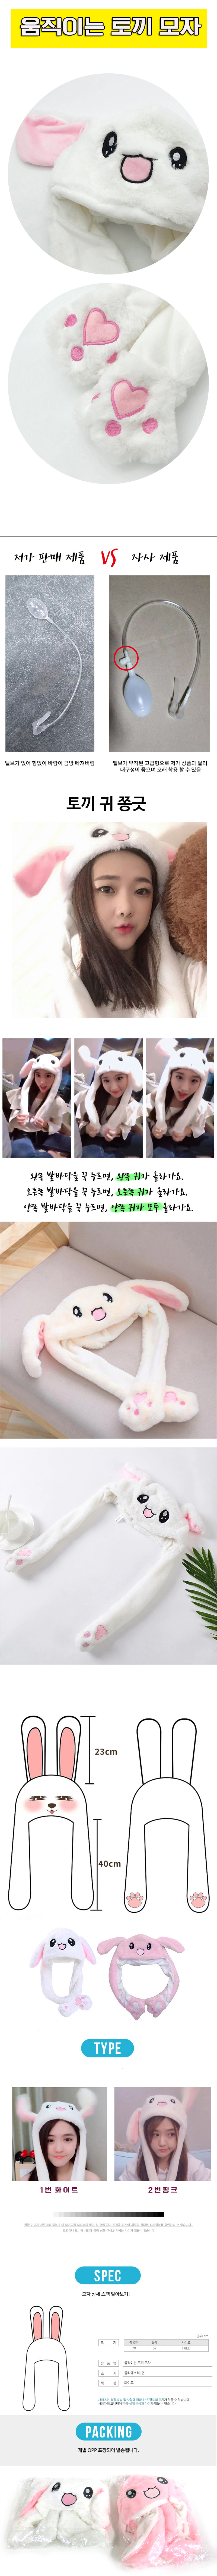 rabbitHat---1.jpg